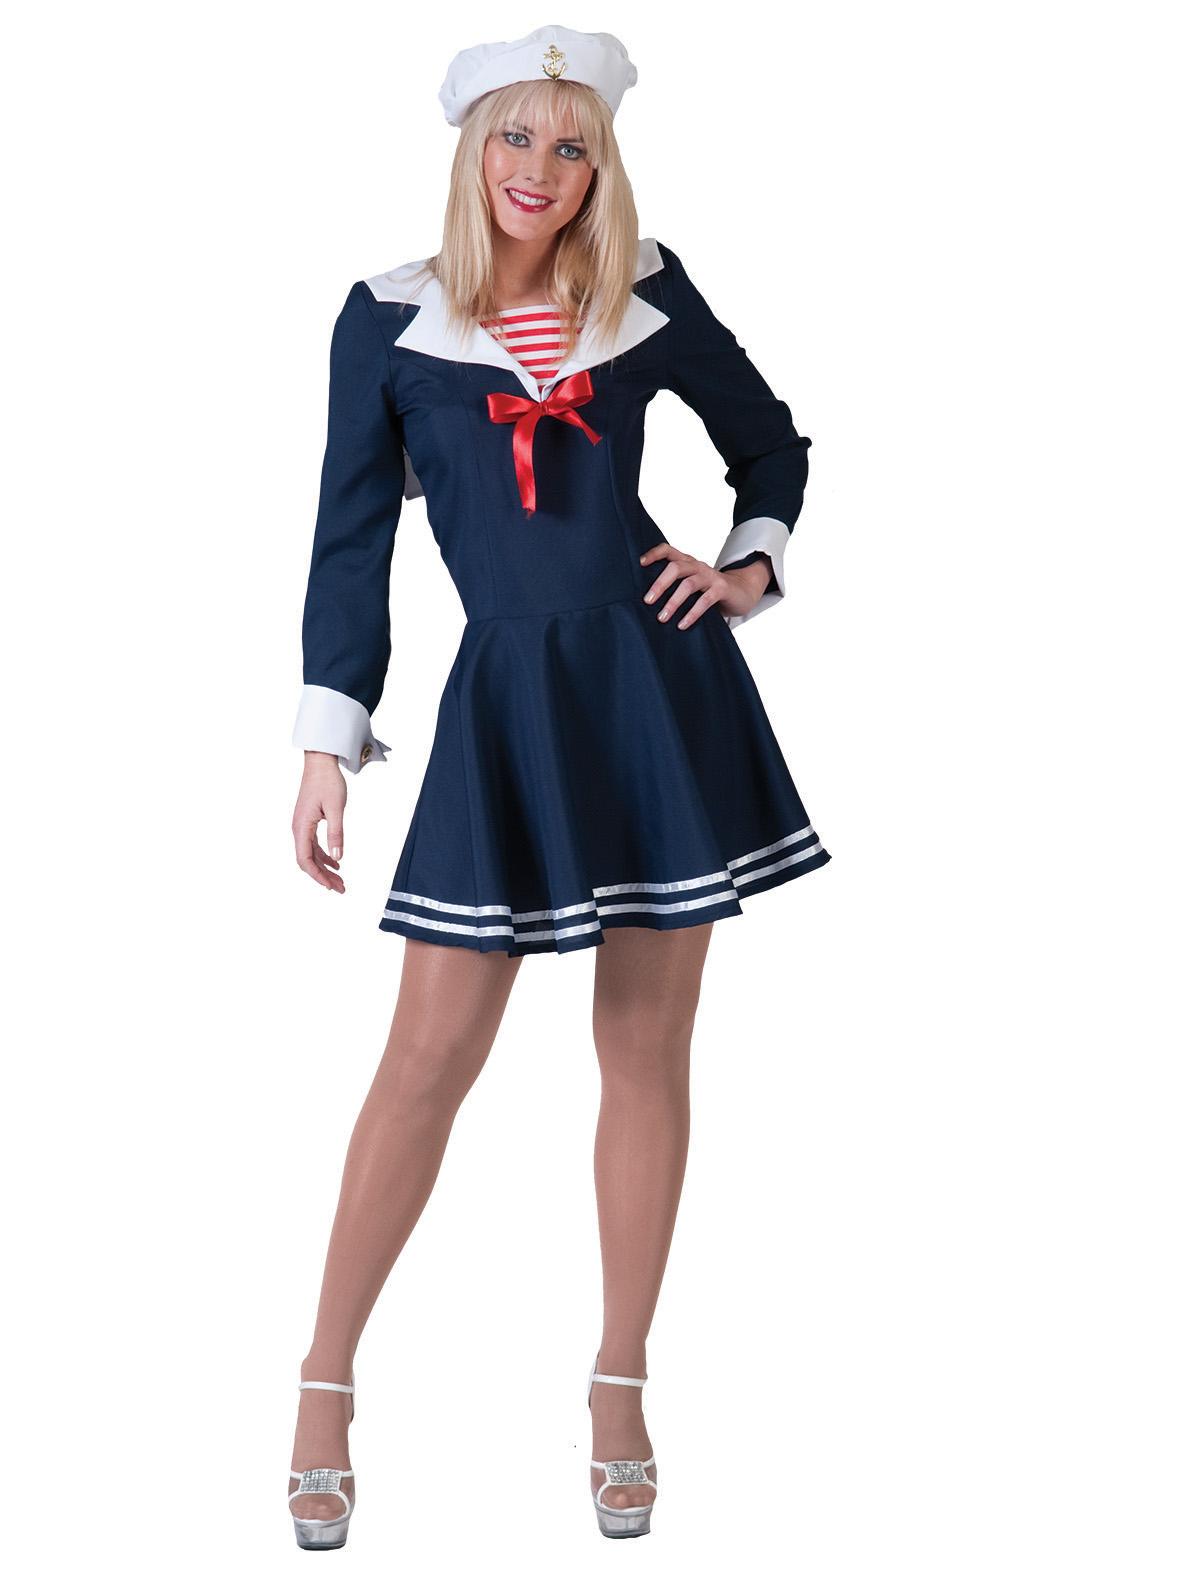 Marinegirl Eltje